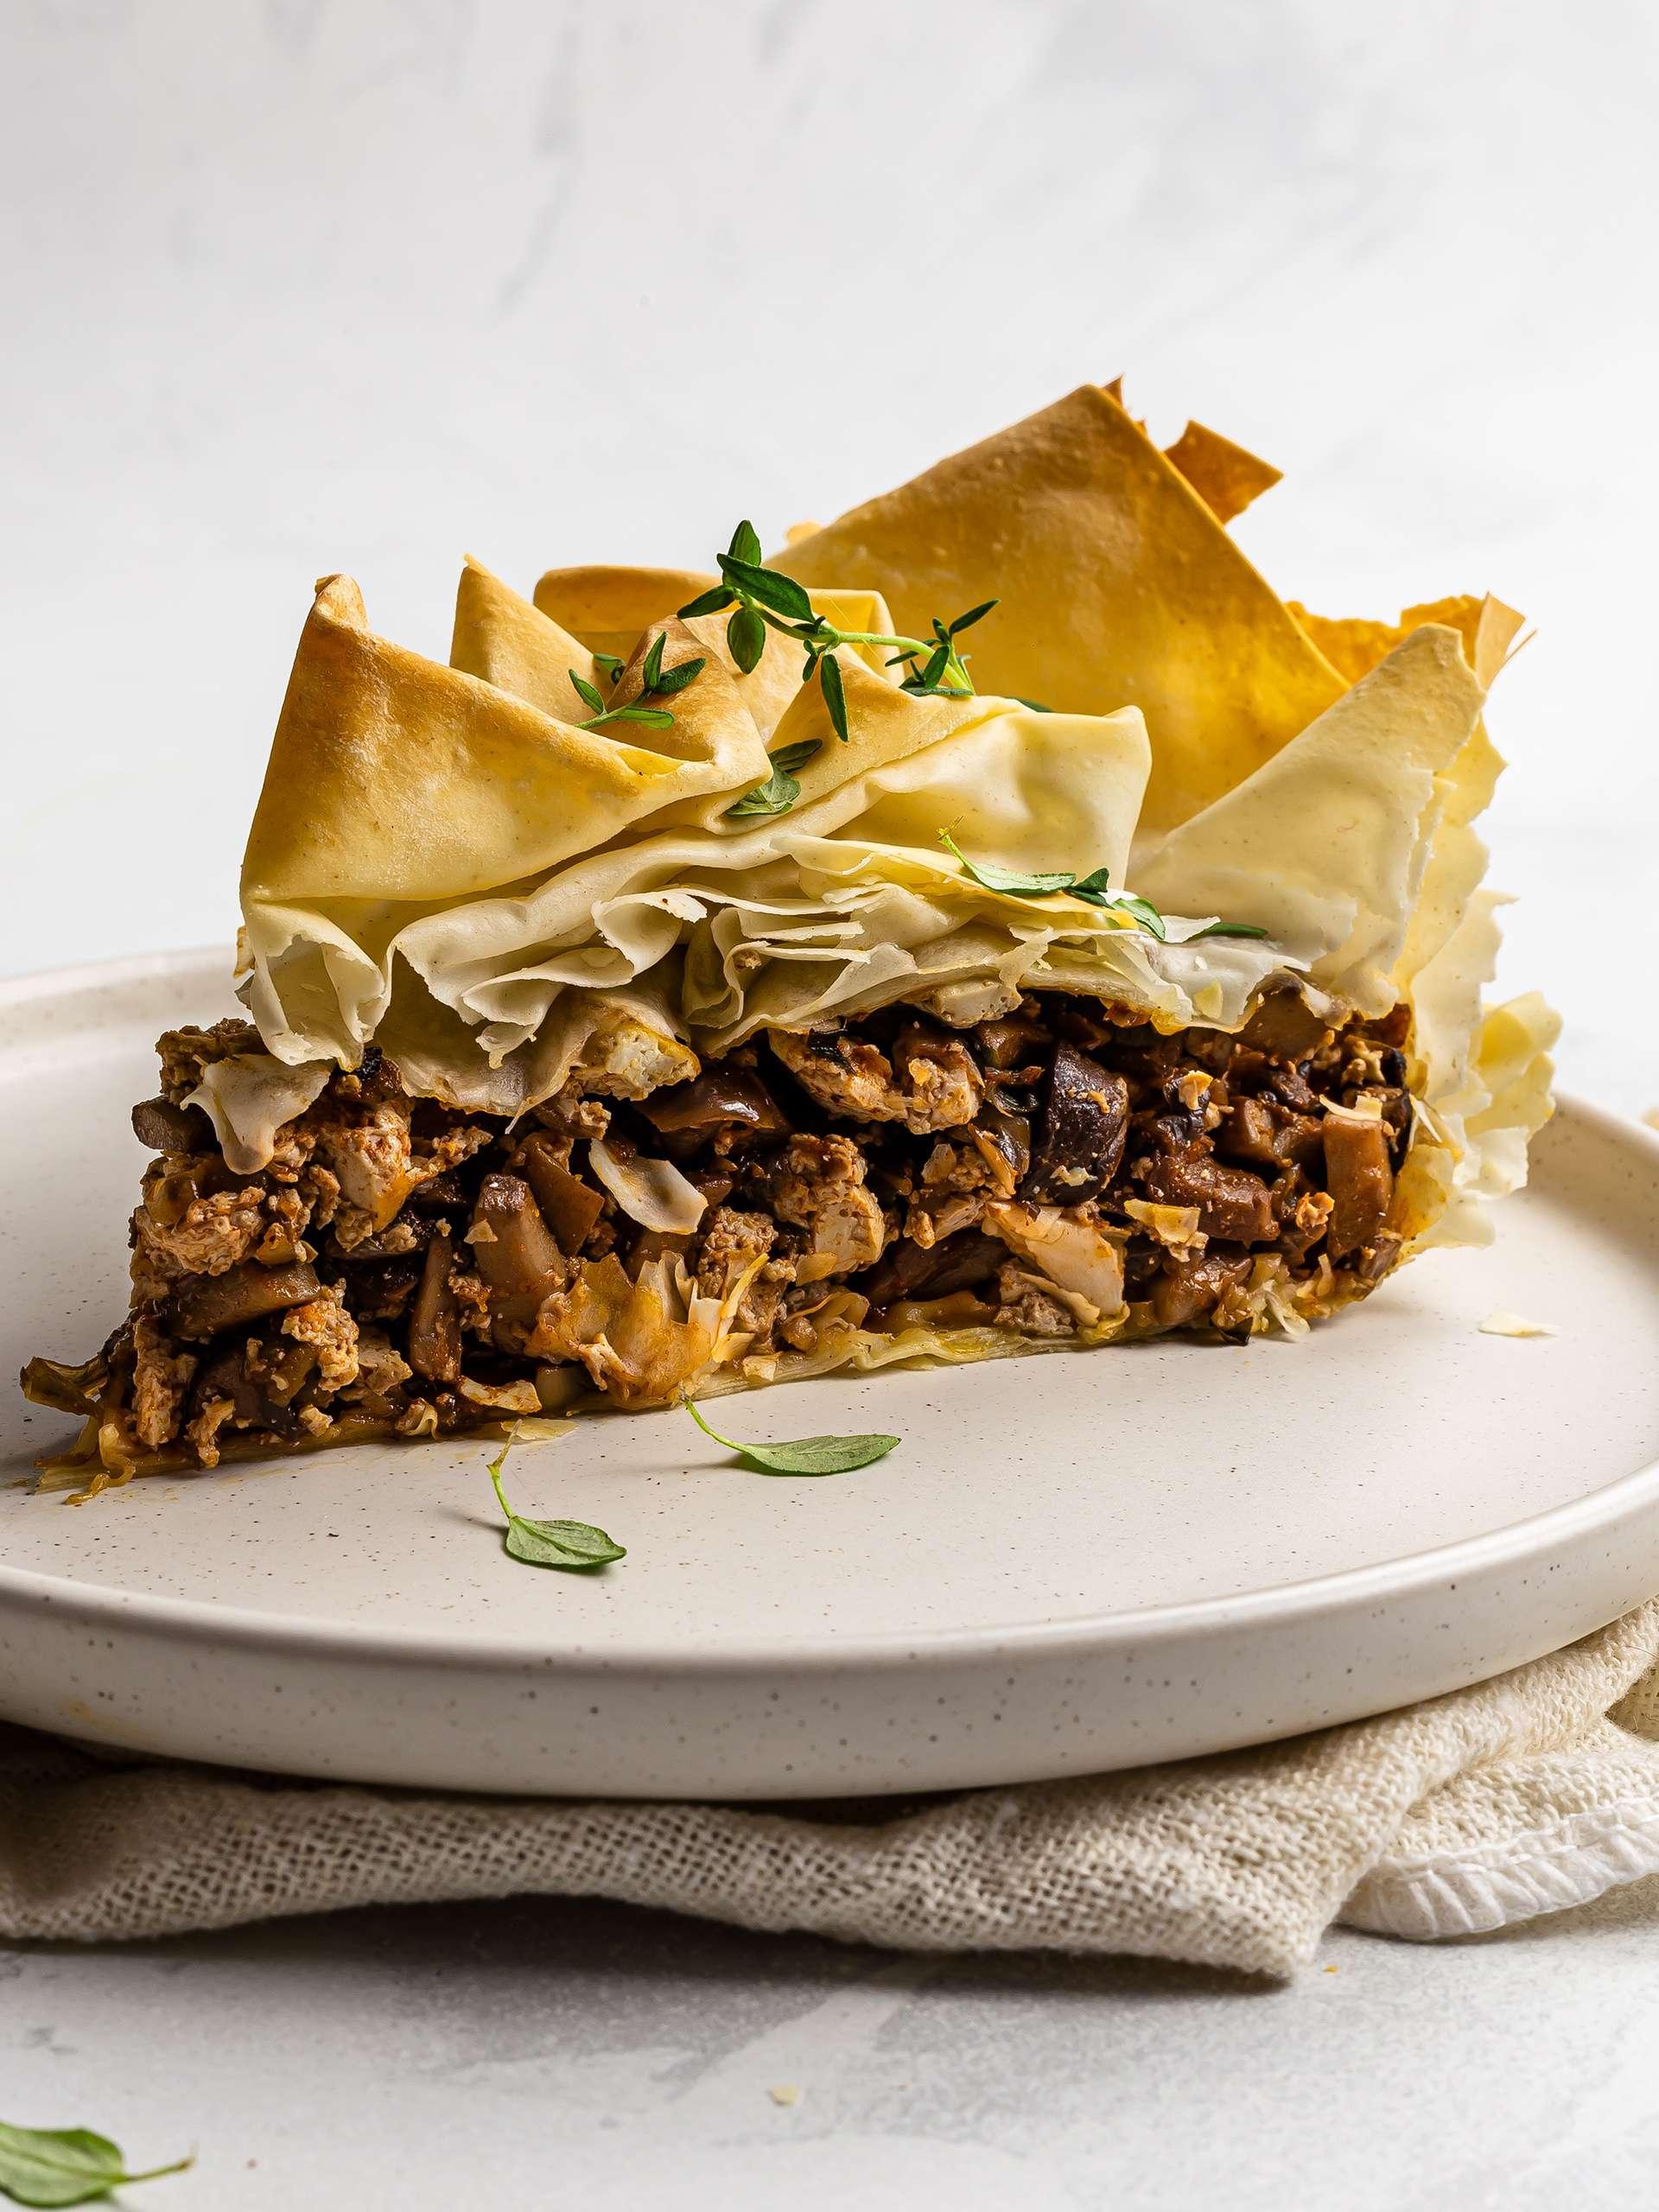 baked mushroom filo pastry pie